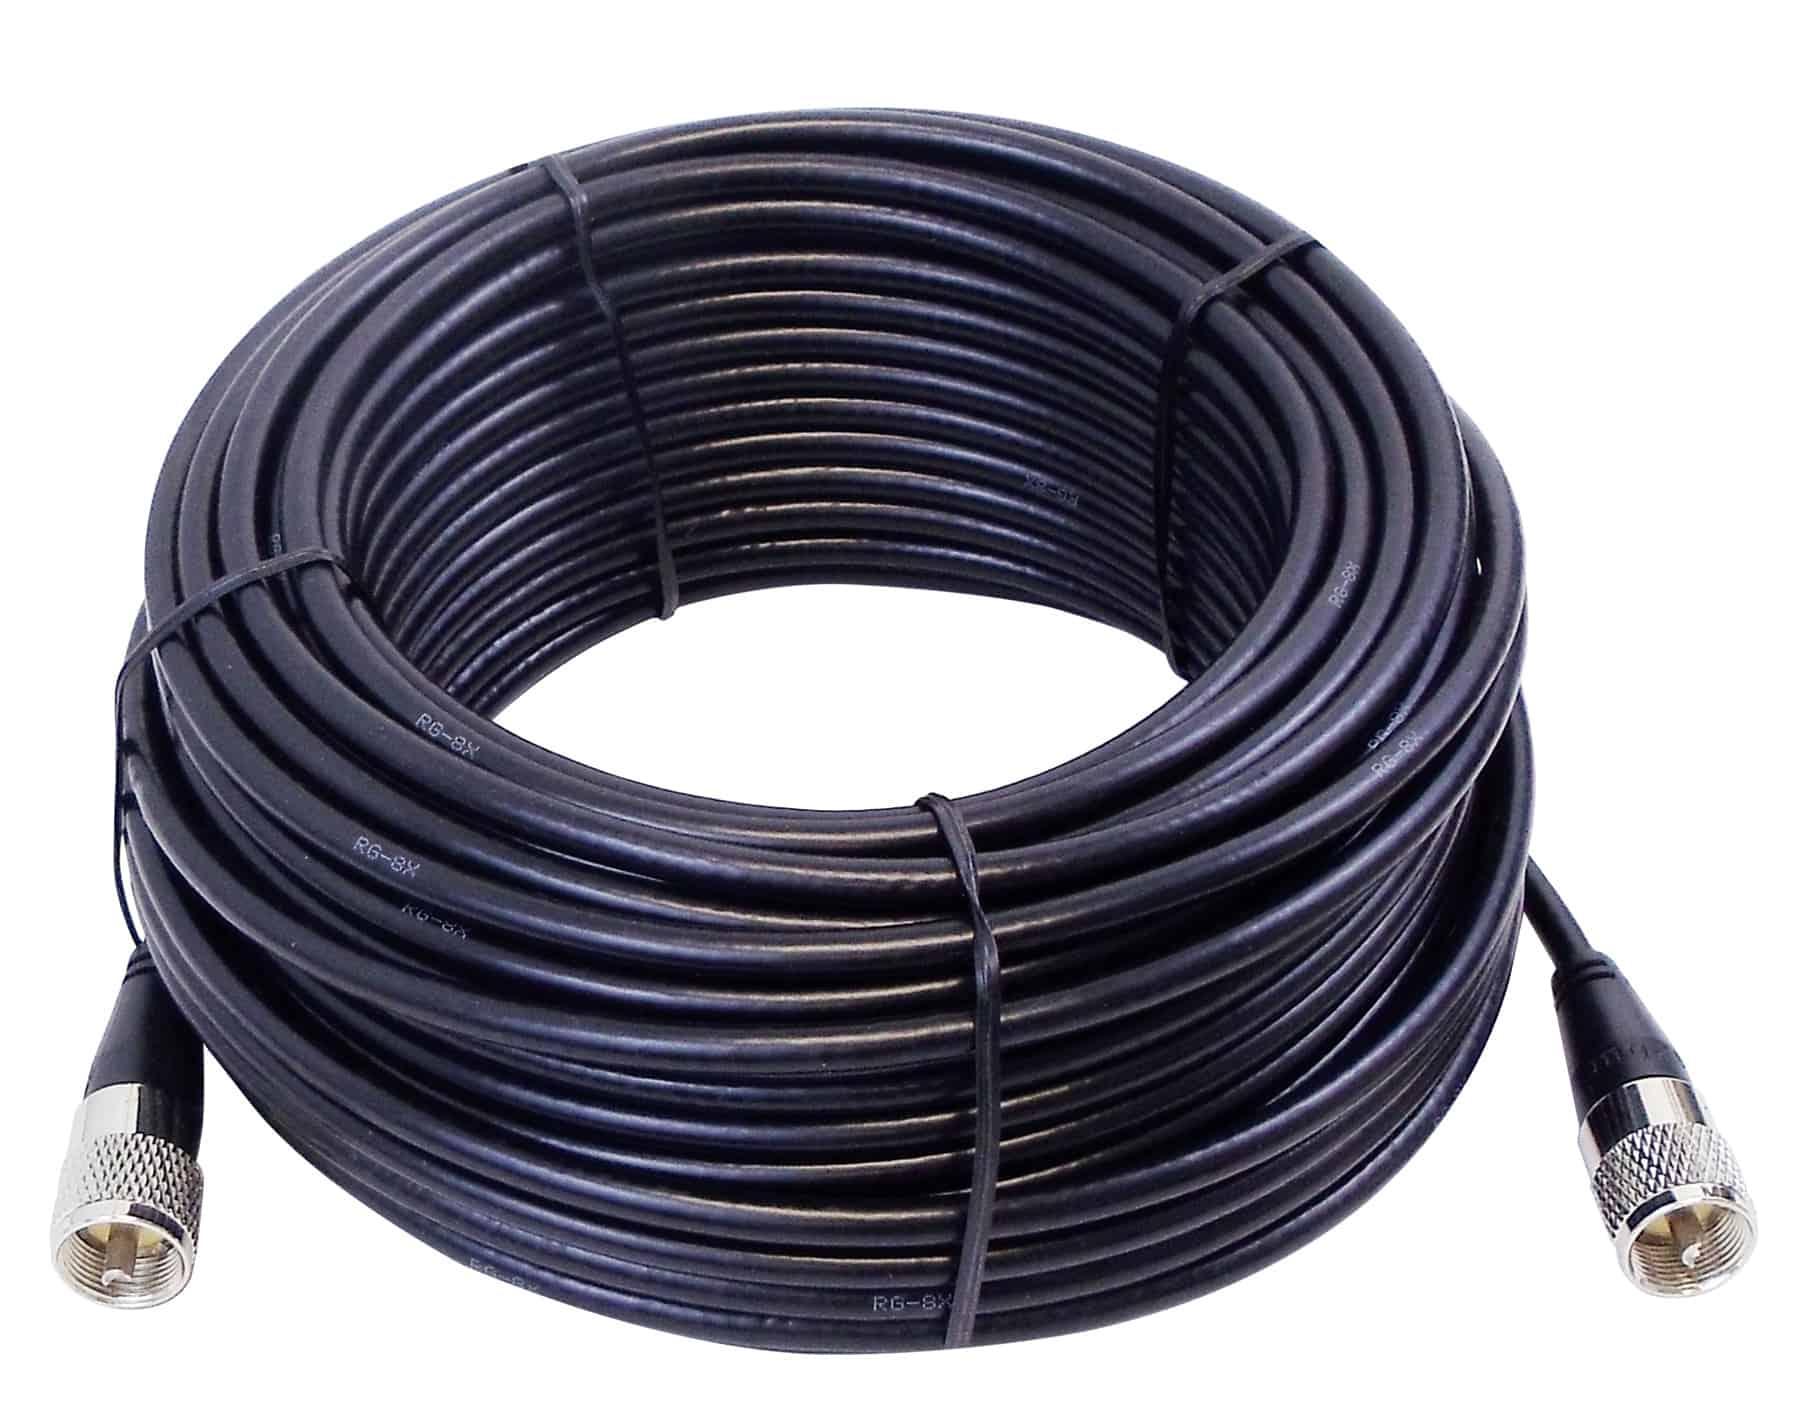 KPP8X75-B - Kalibur 75' RG8X PL259 to PL259 Coax Cable Assembly